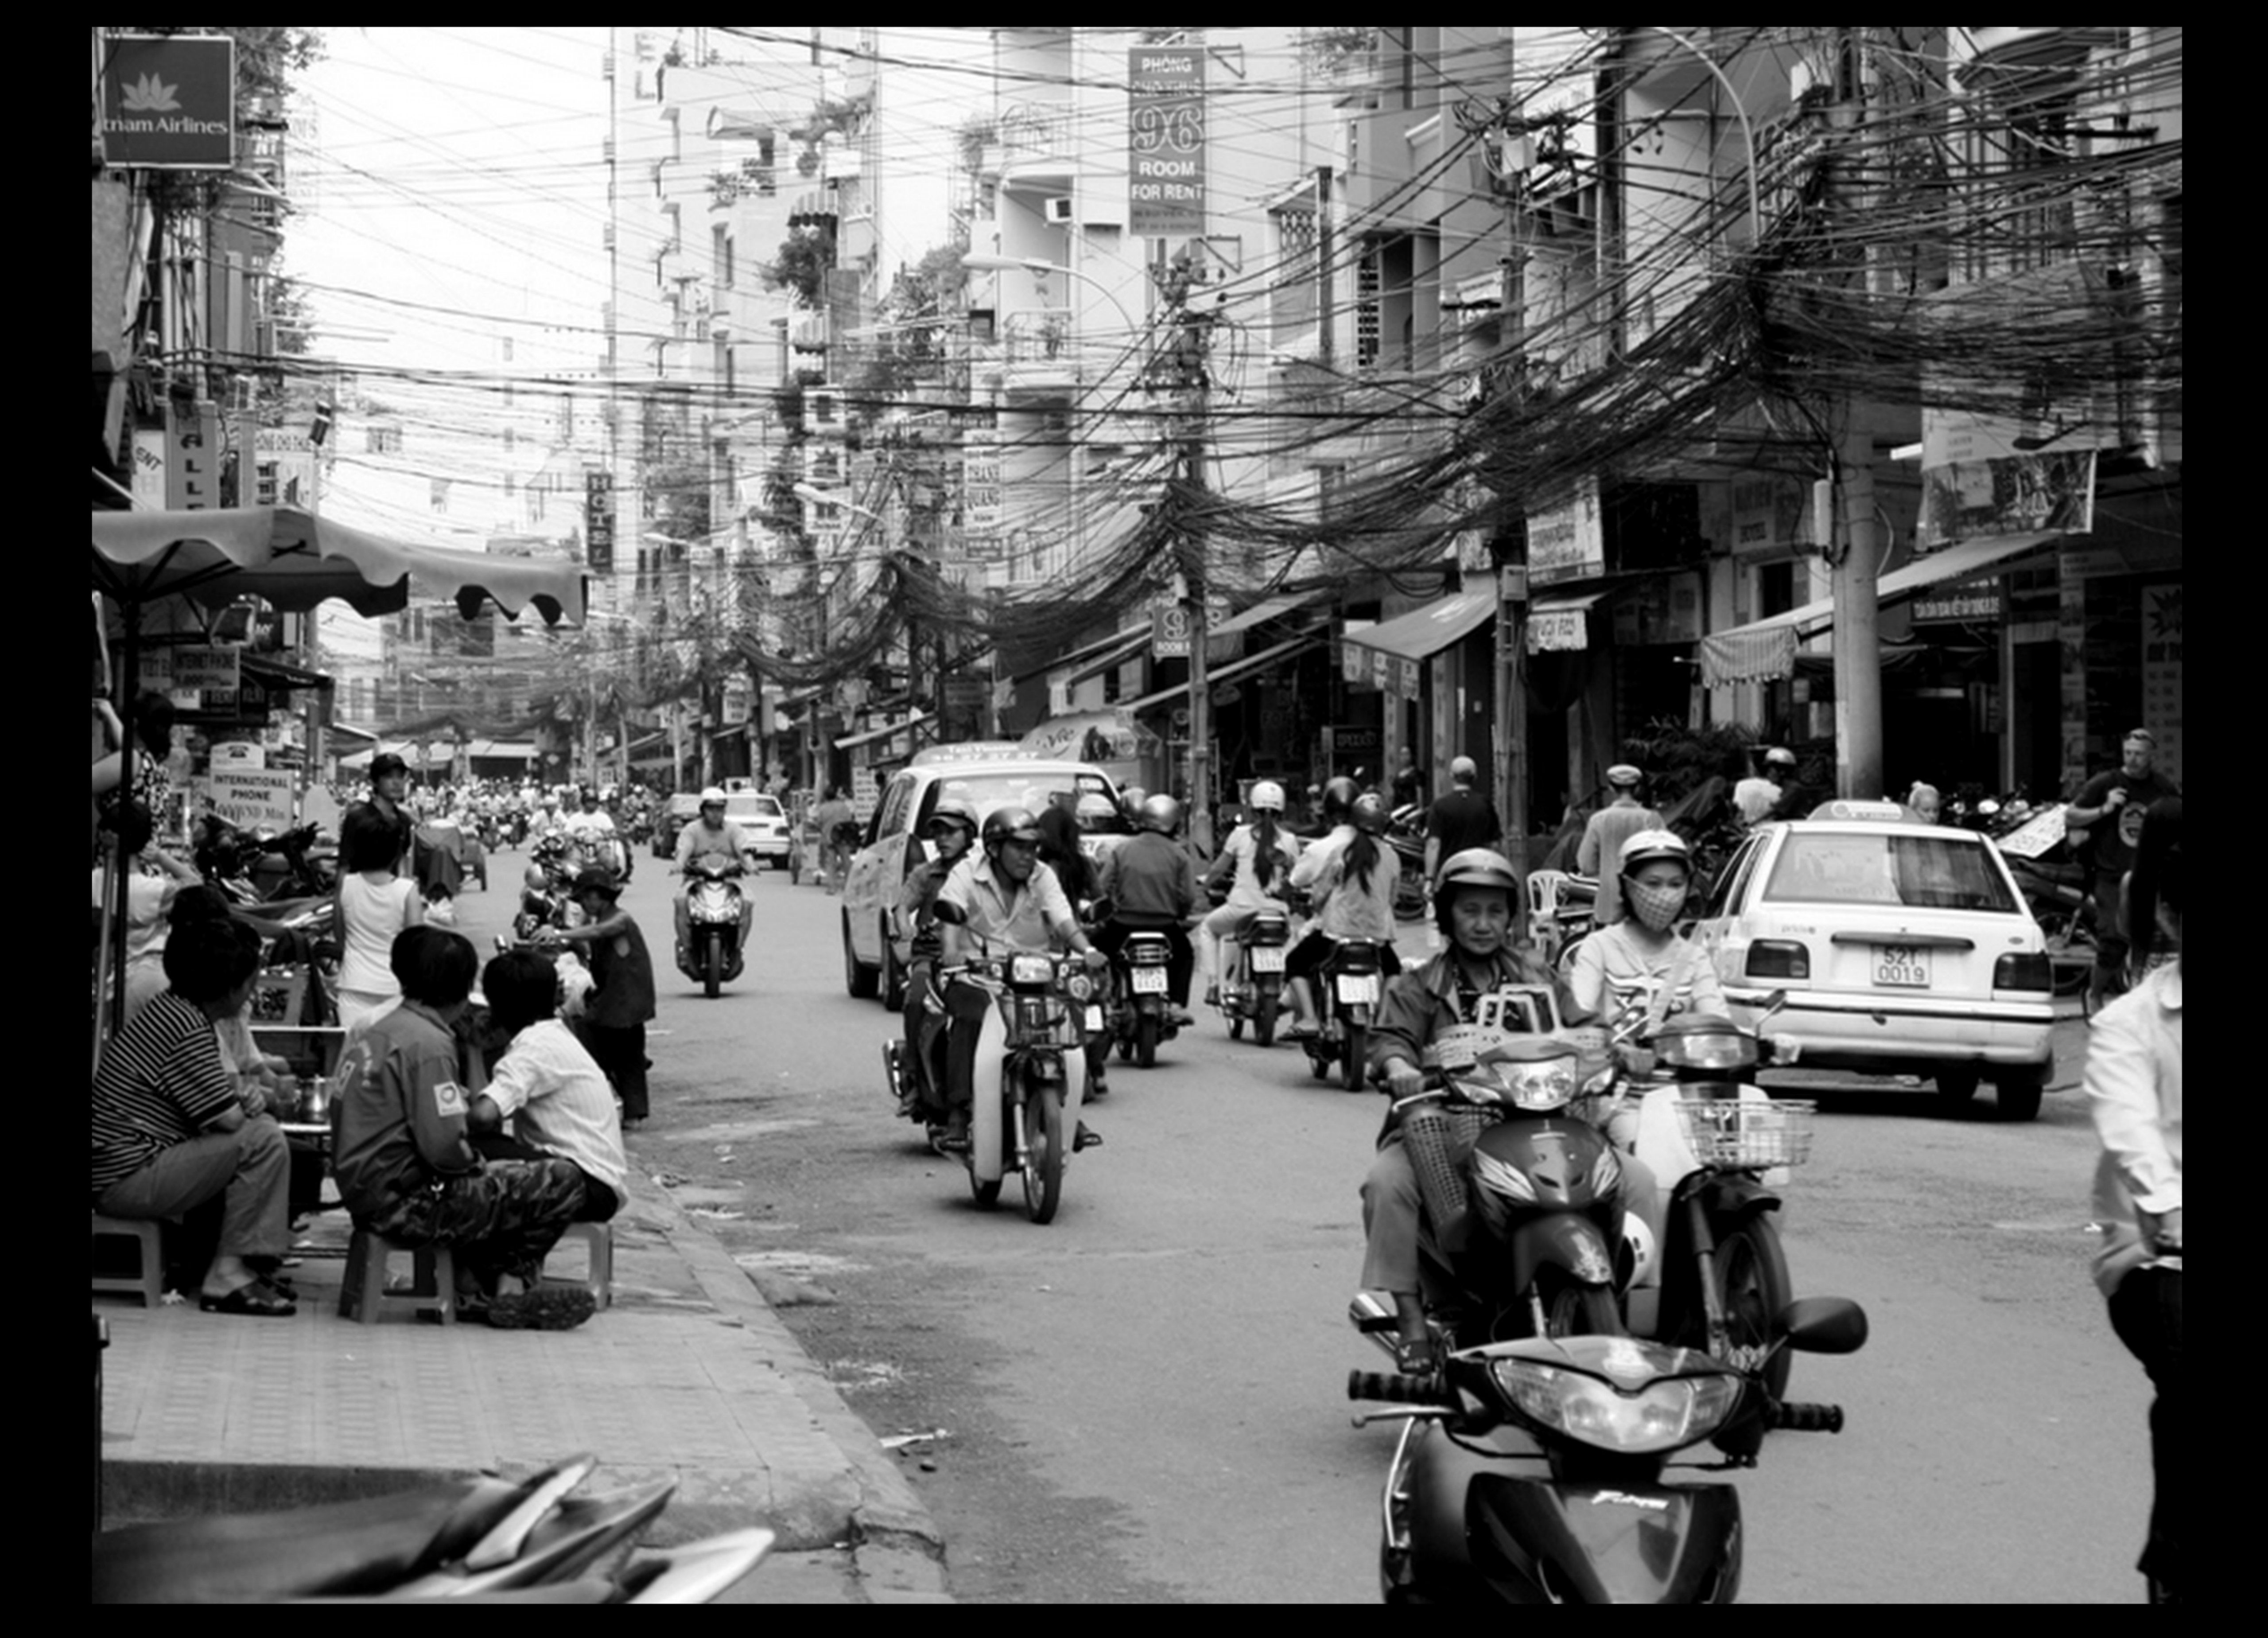 Saigon_Julho 2009